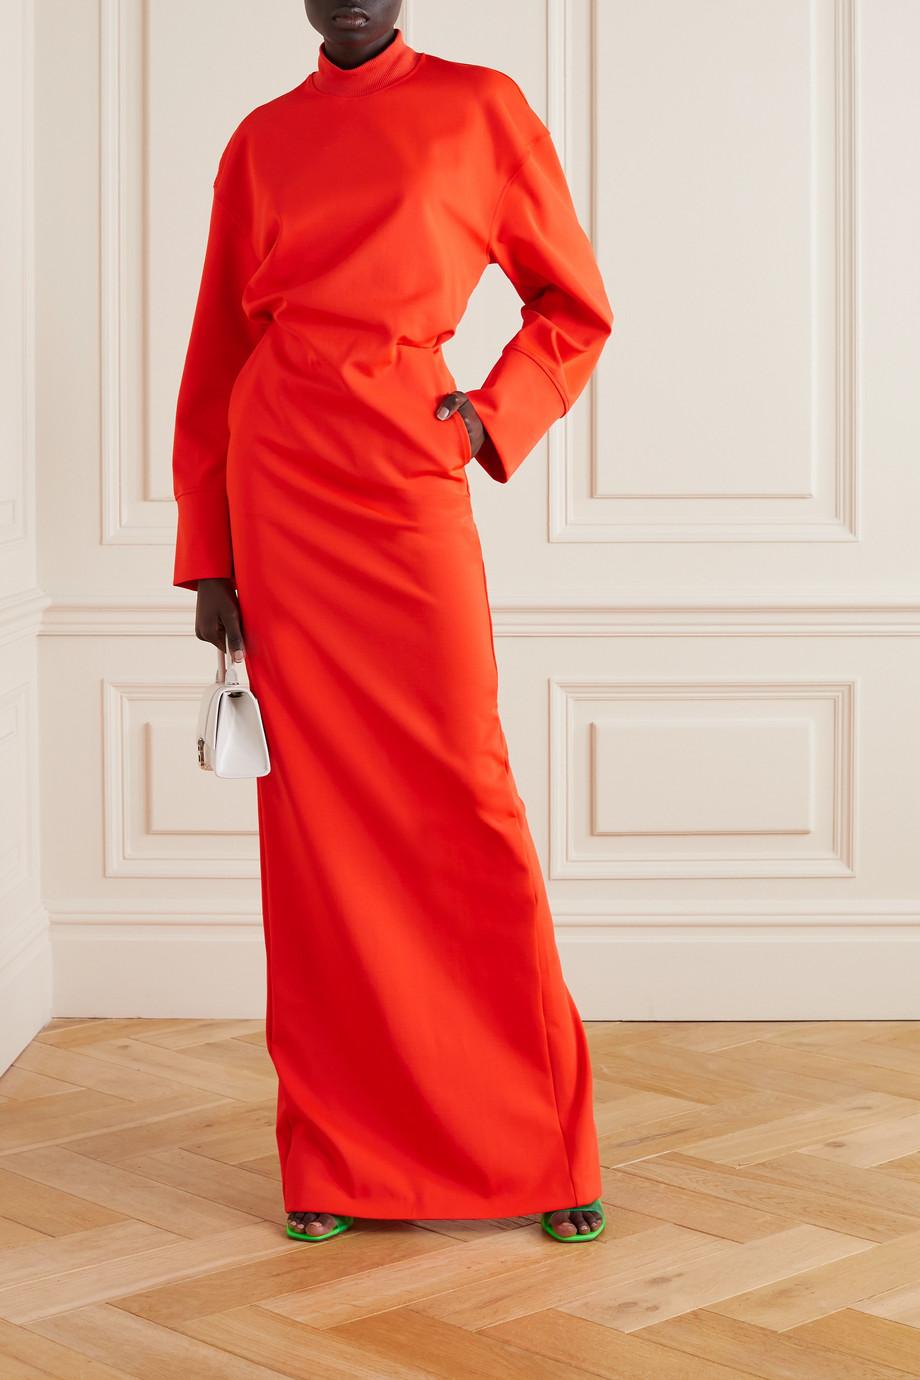 The Attico Stretch-knit maxi dress